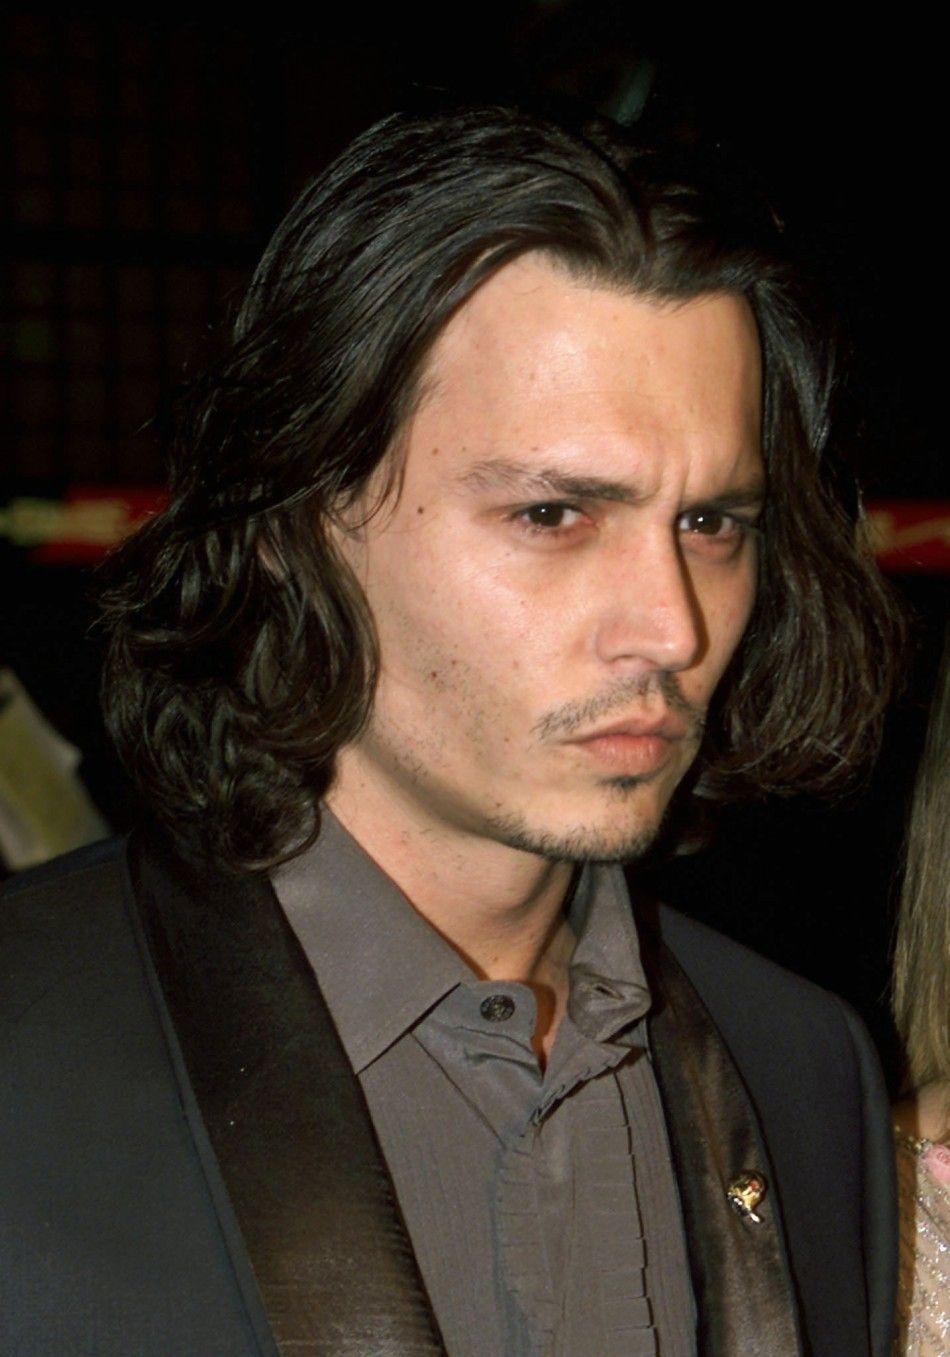 Johnny With Long Hair Johnny Depp Photo 32467264 Fanpop Johnny Depp Hairstyle Johnny Depp Johnny